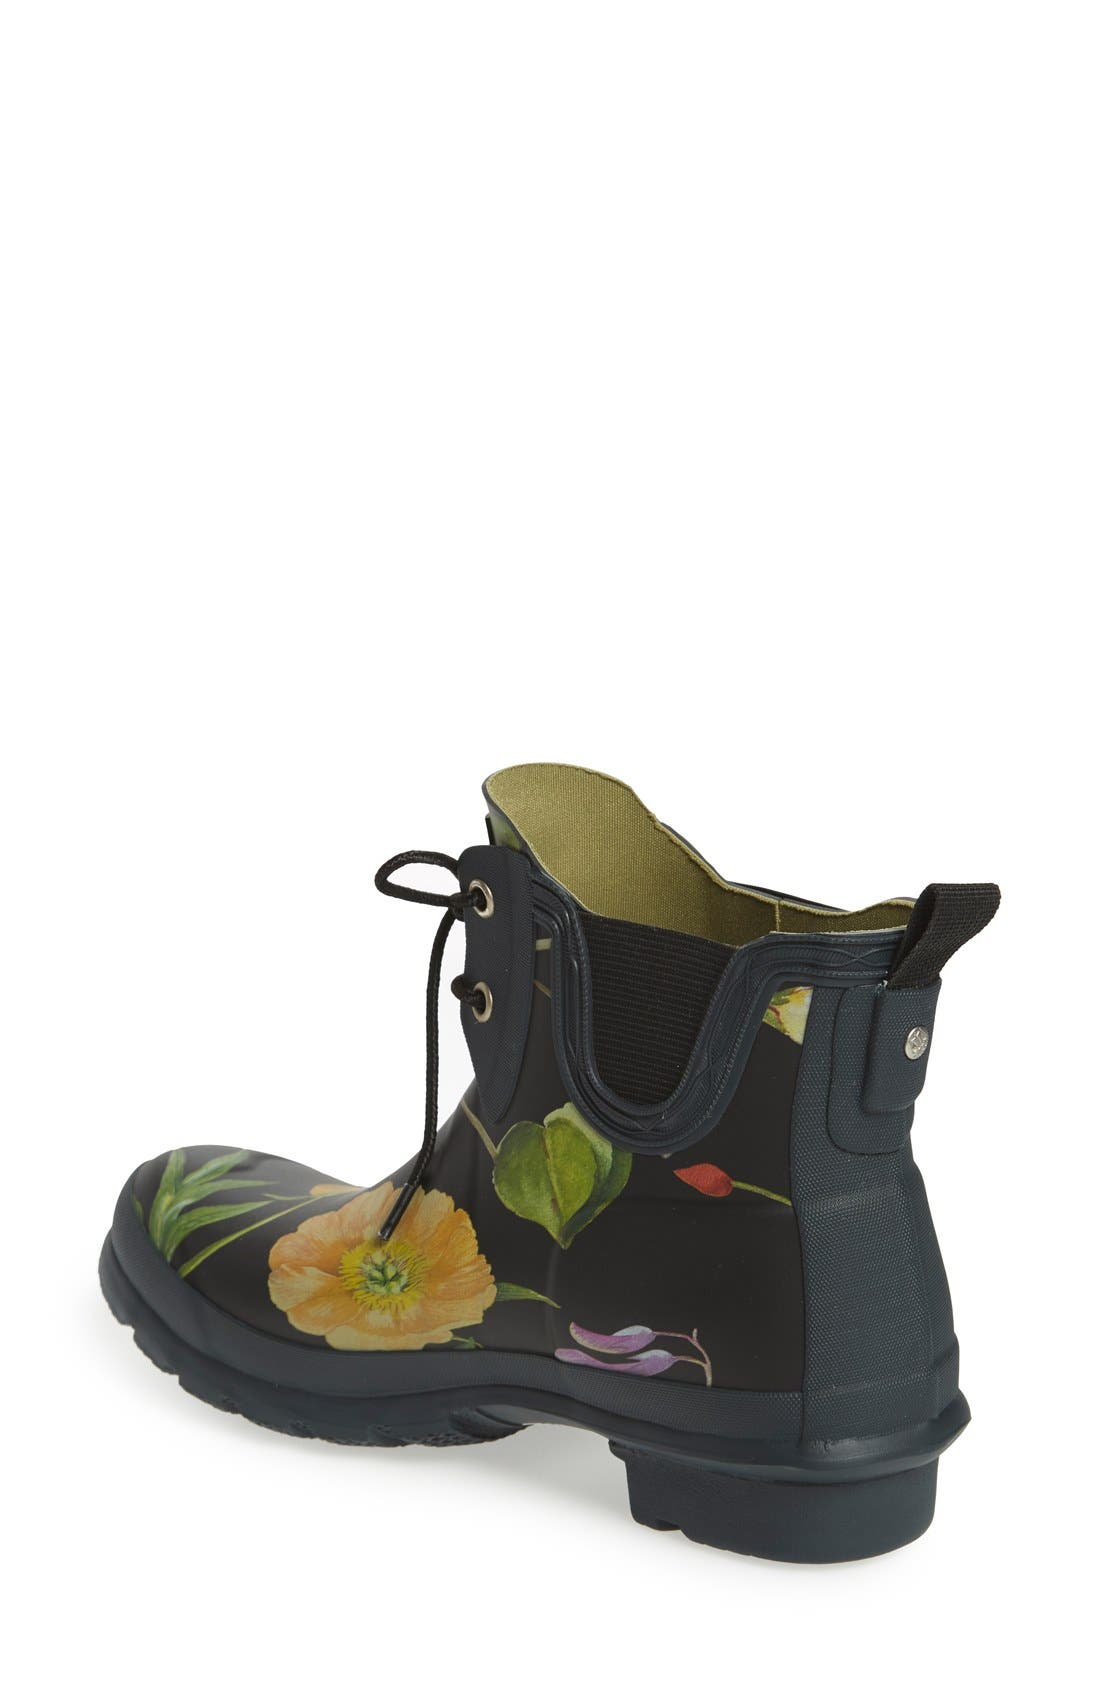 Alternate Image 2  - Hunter 'Royal Horticultural Society' Waterproof Lace-Up Short Rain Boot (Women)